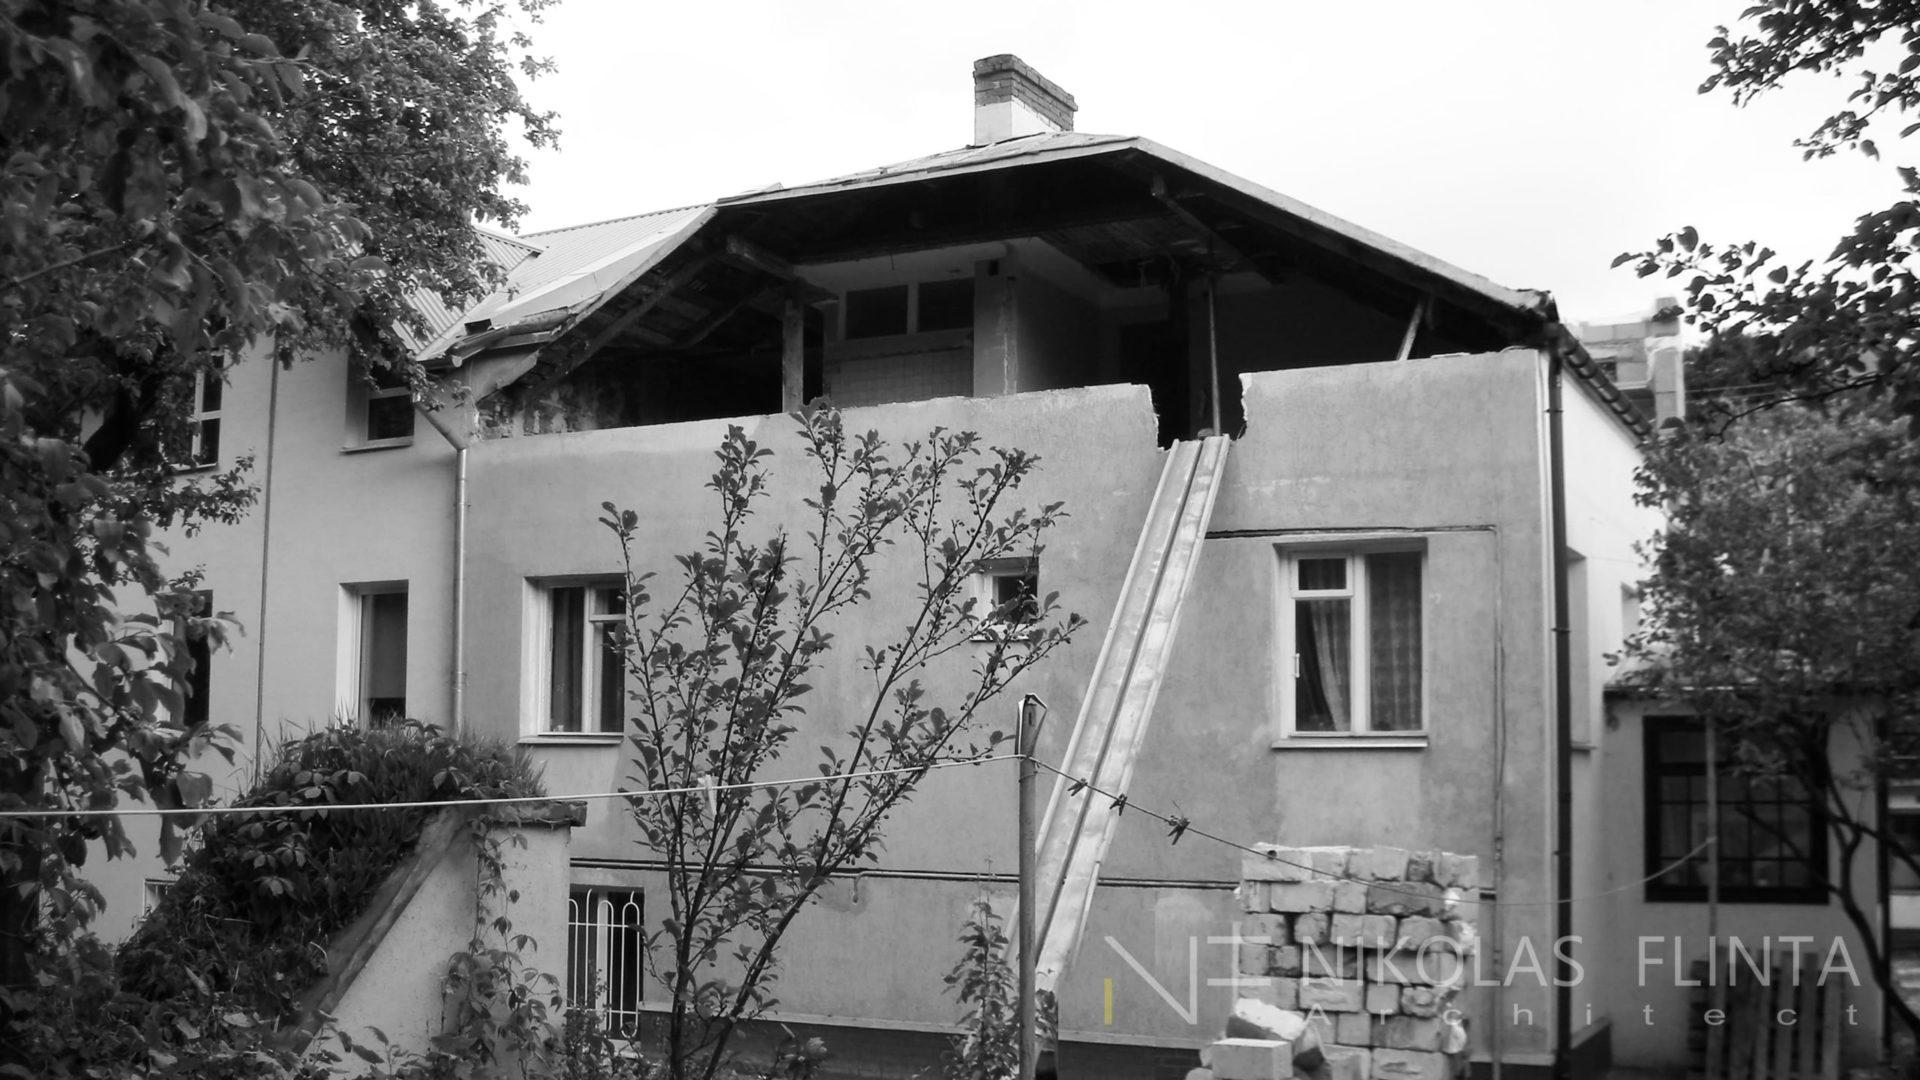 House-06PE_06-scaled.jpg